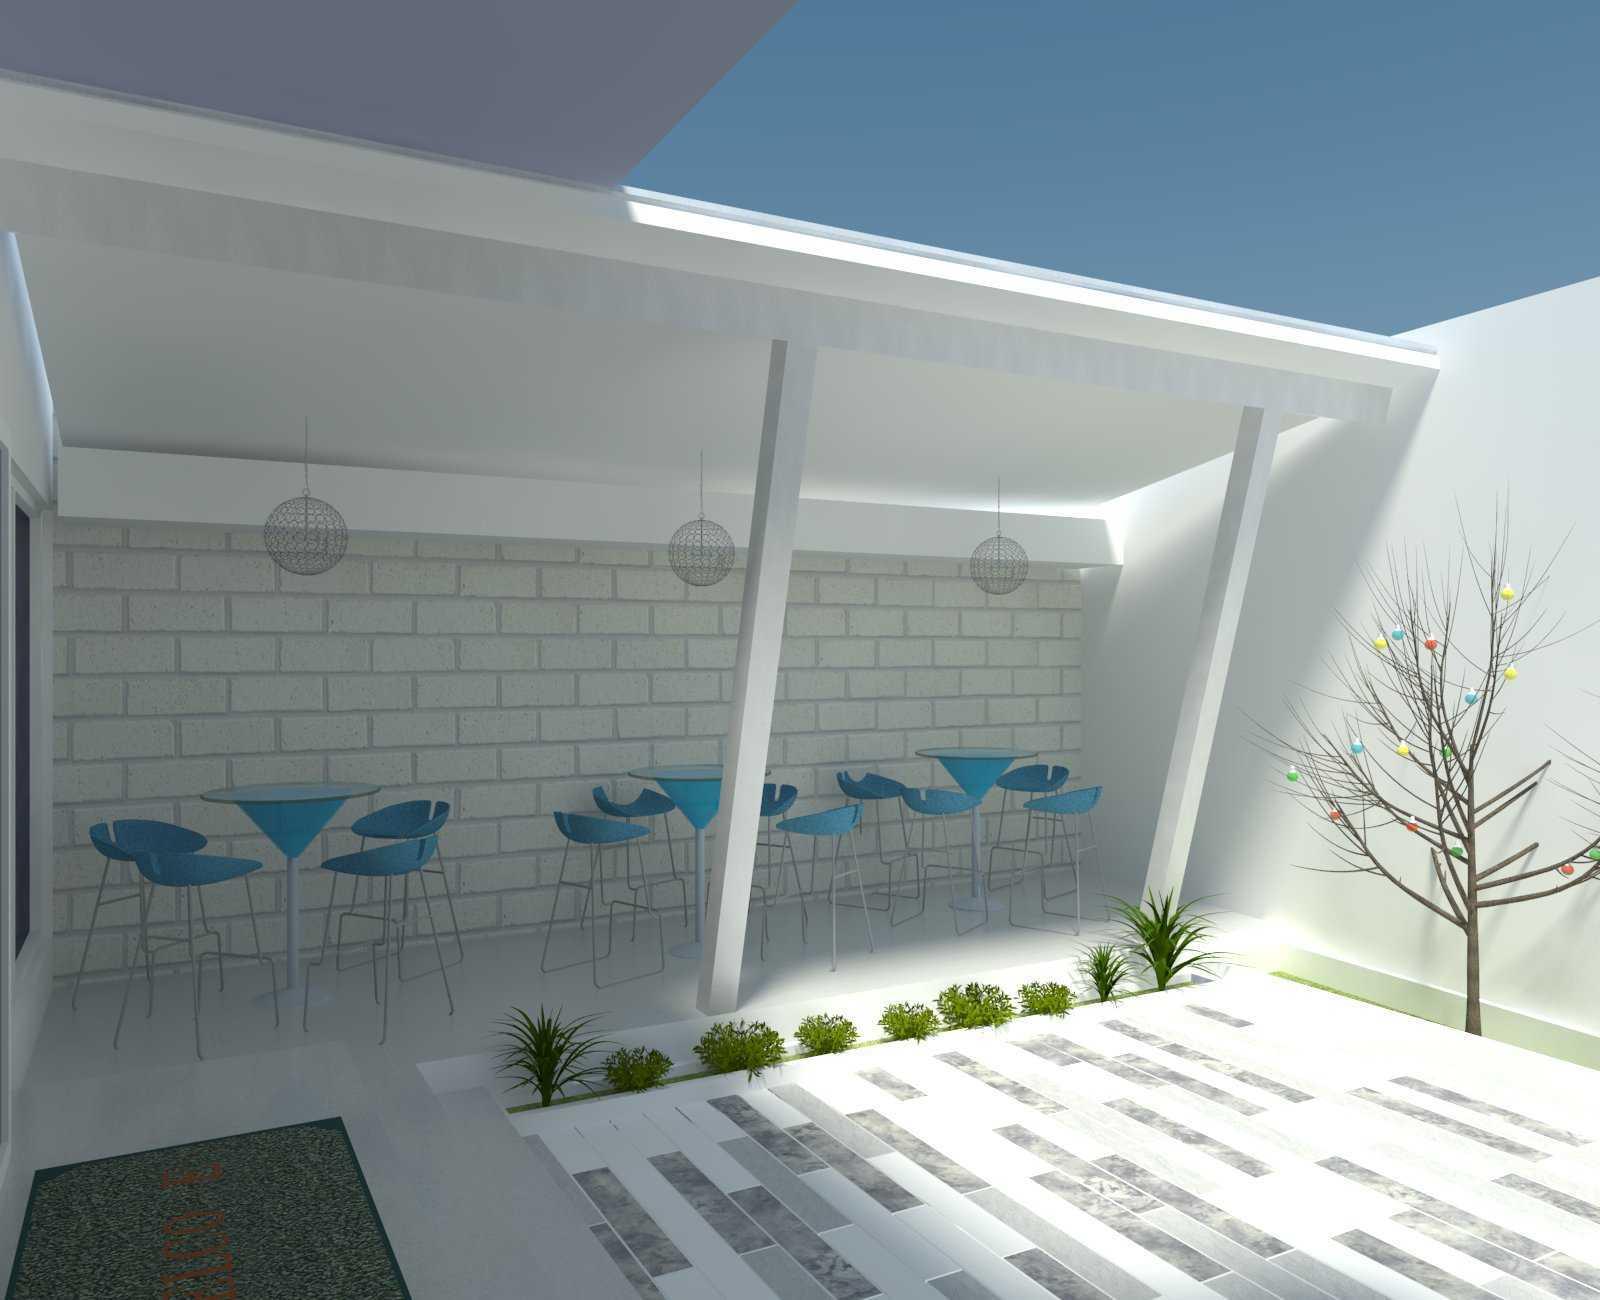 Rqt8 Frozen Cafe Garut Kota, Garut Regency, West Java, Indonesia Garut Eksterior-Belakang-Hd   26817